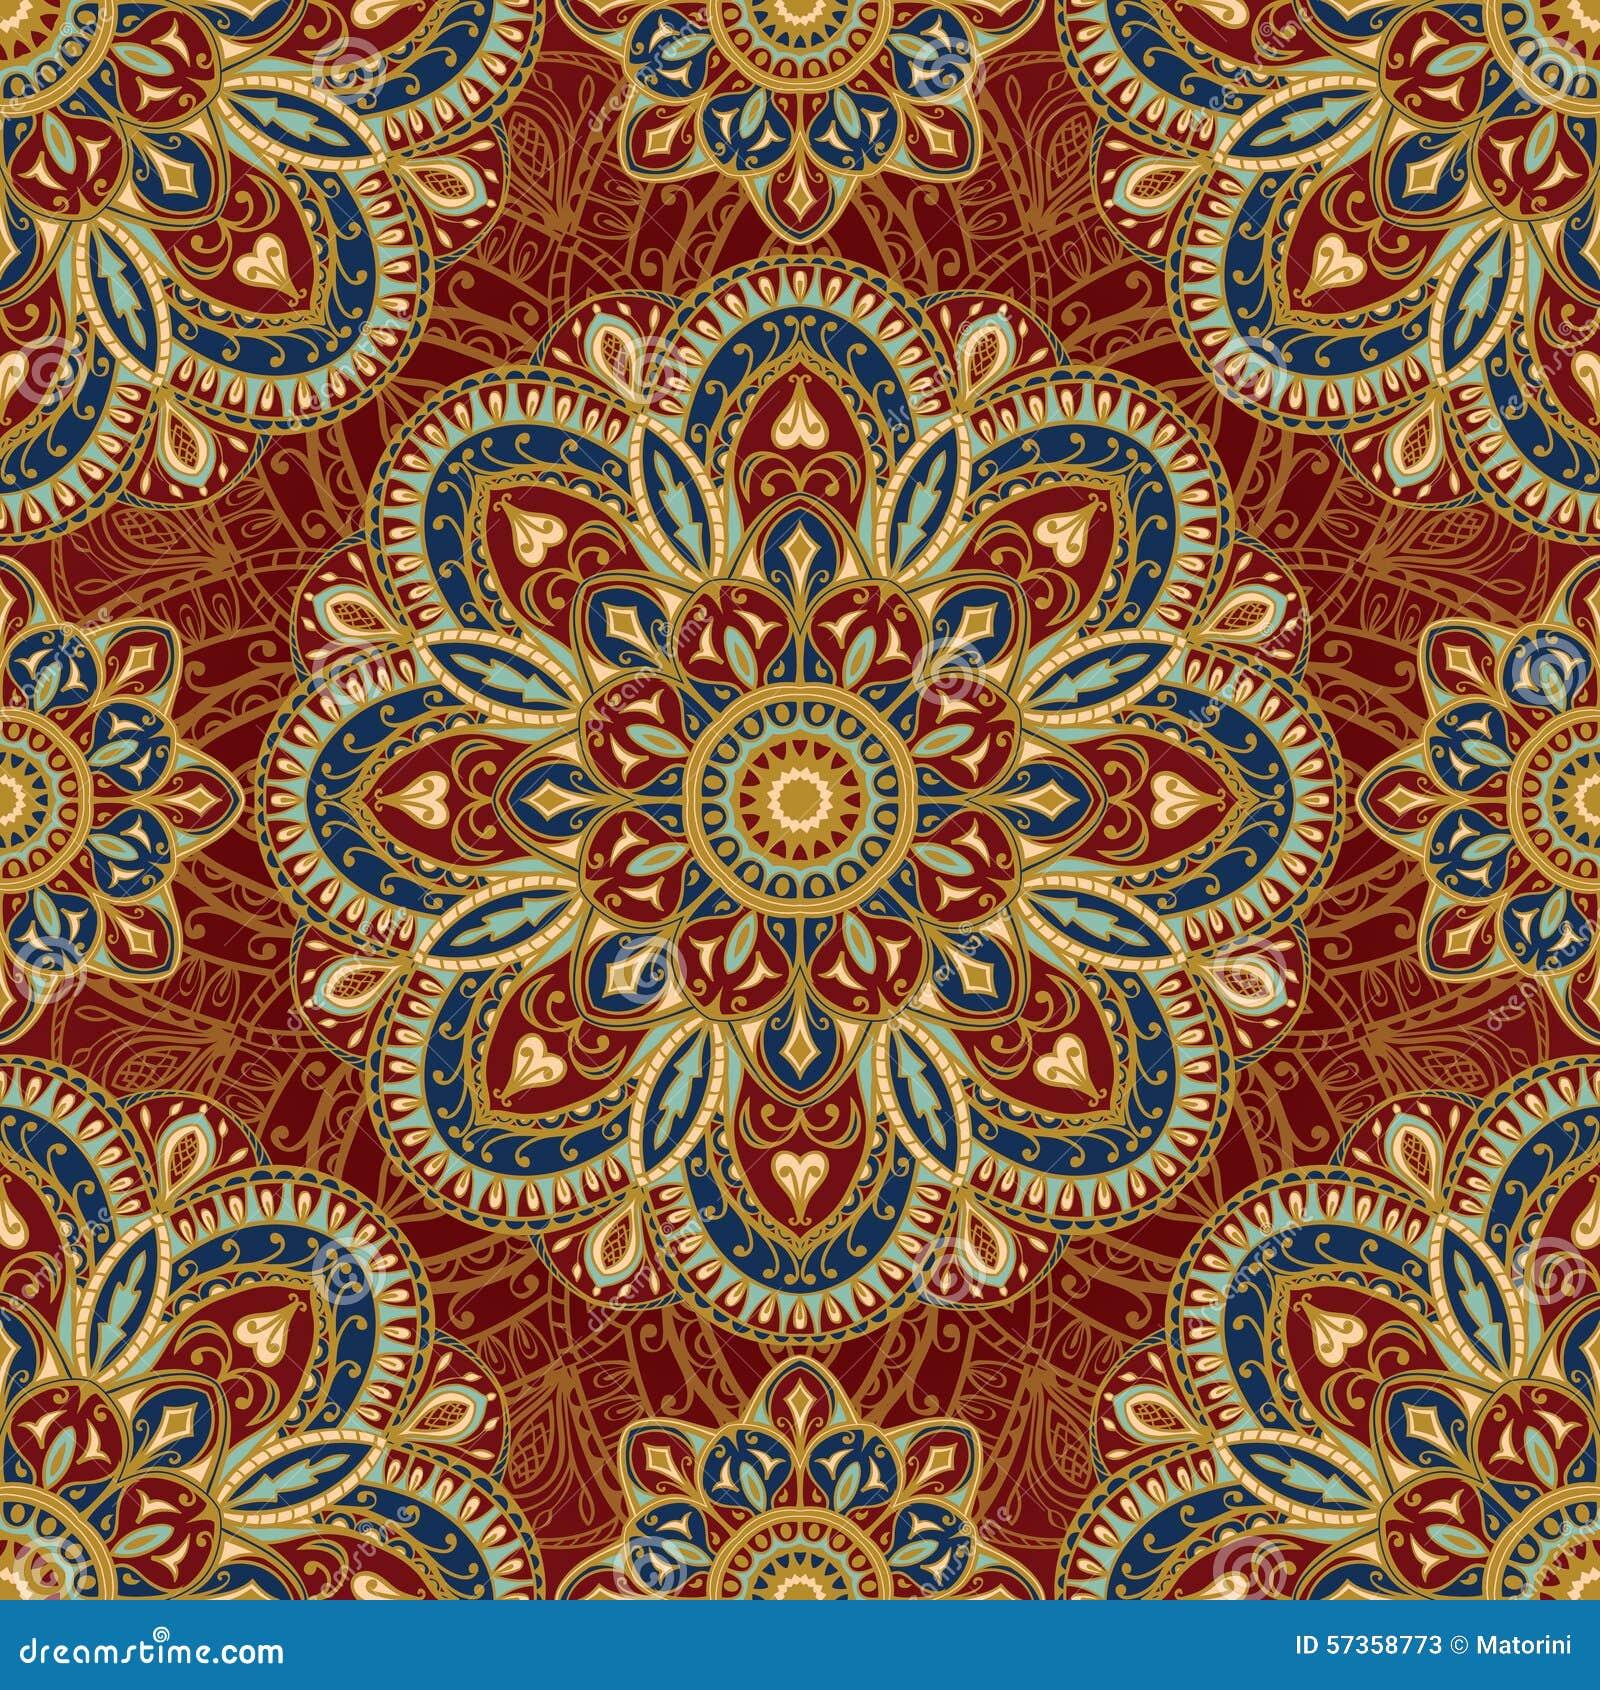 stylized oriental medieval pattern stock vector illustration of mandala carving 57358773. Black Bedroom Furniture Sets. Home Design Ideas